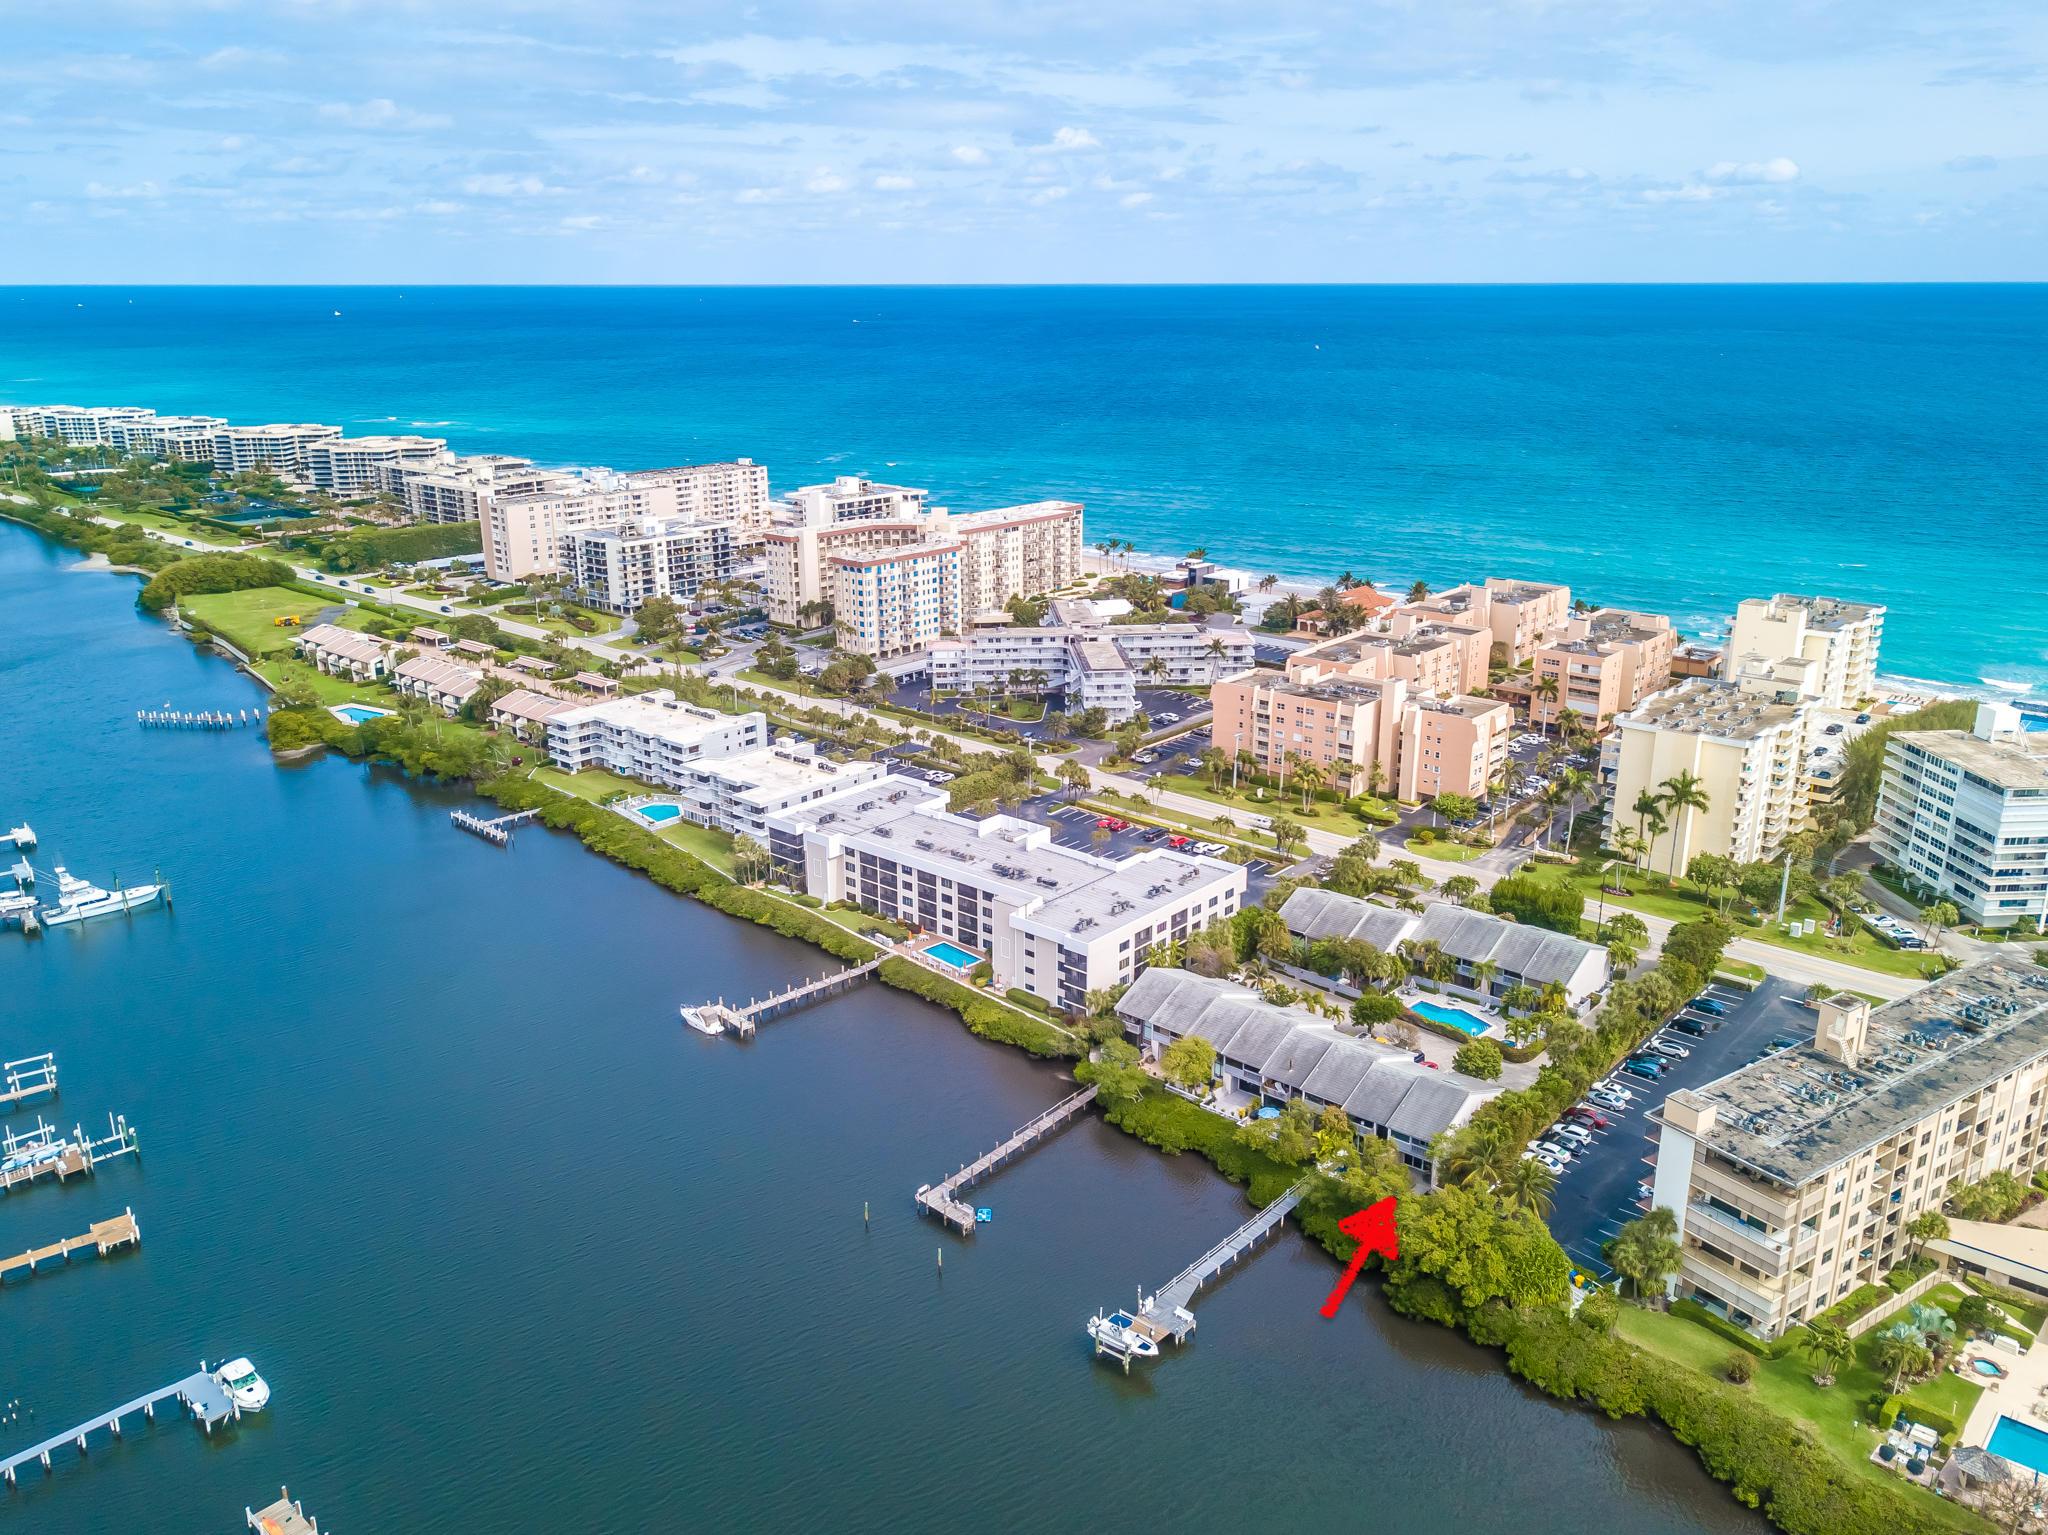 3543 Ocean Boulevard 108, Lantana, Florida 33462, 2 Bedrooms Bedrooms, ,2.1 BathroomsBathrooms,A,Townhouse,Ocean,RX-10600941